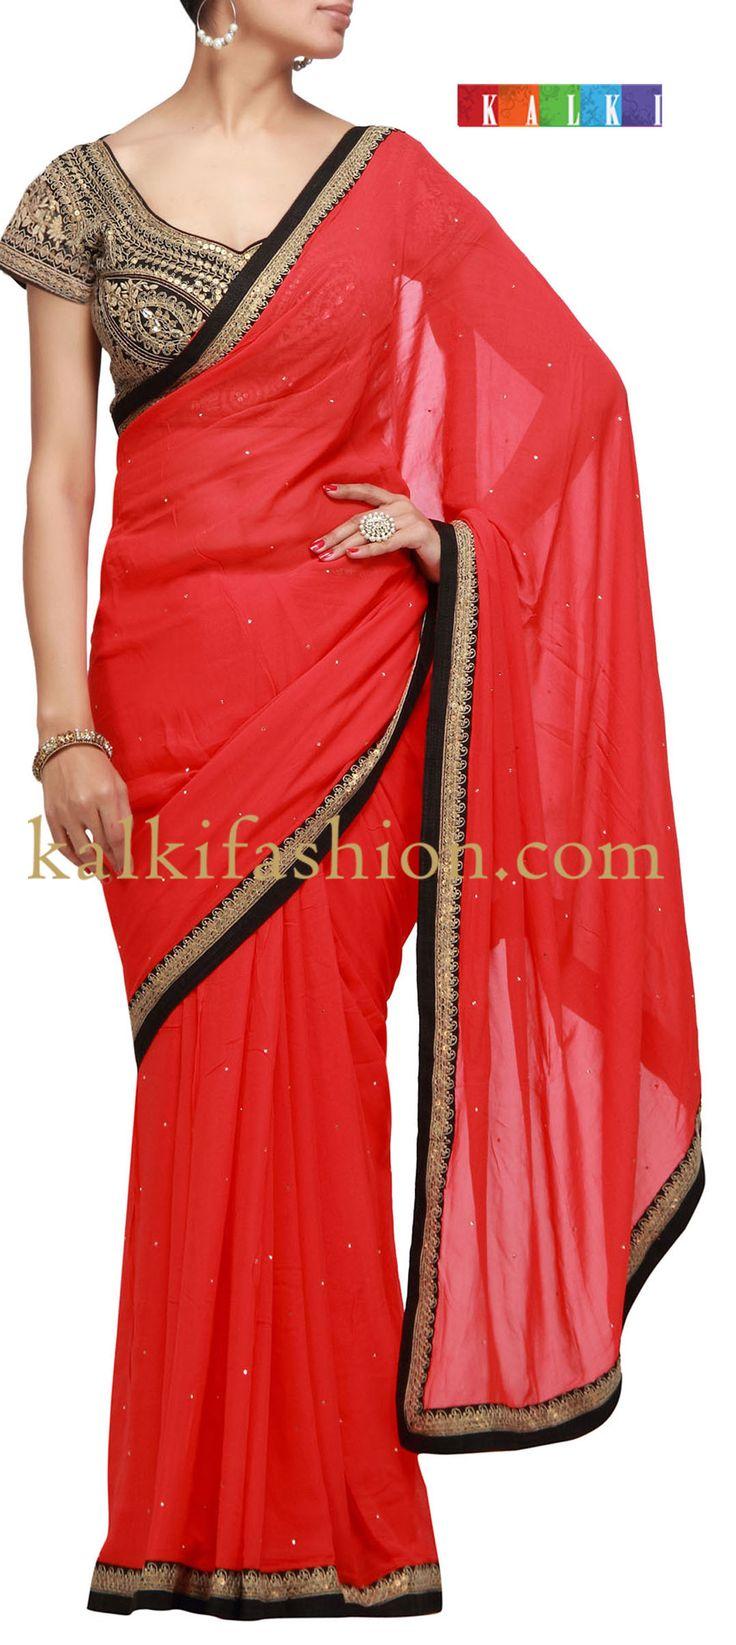 Buy it now  http://www.kalkifashion.com/red-chiffon-saree-with-badla-work.html  Red chiffon saree with badla work